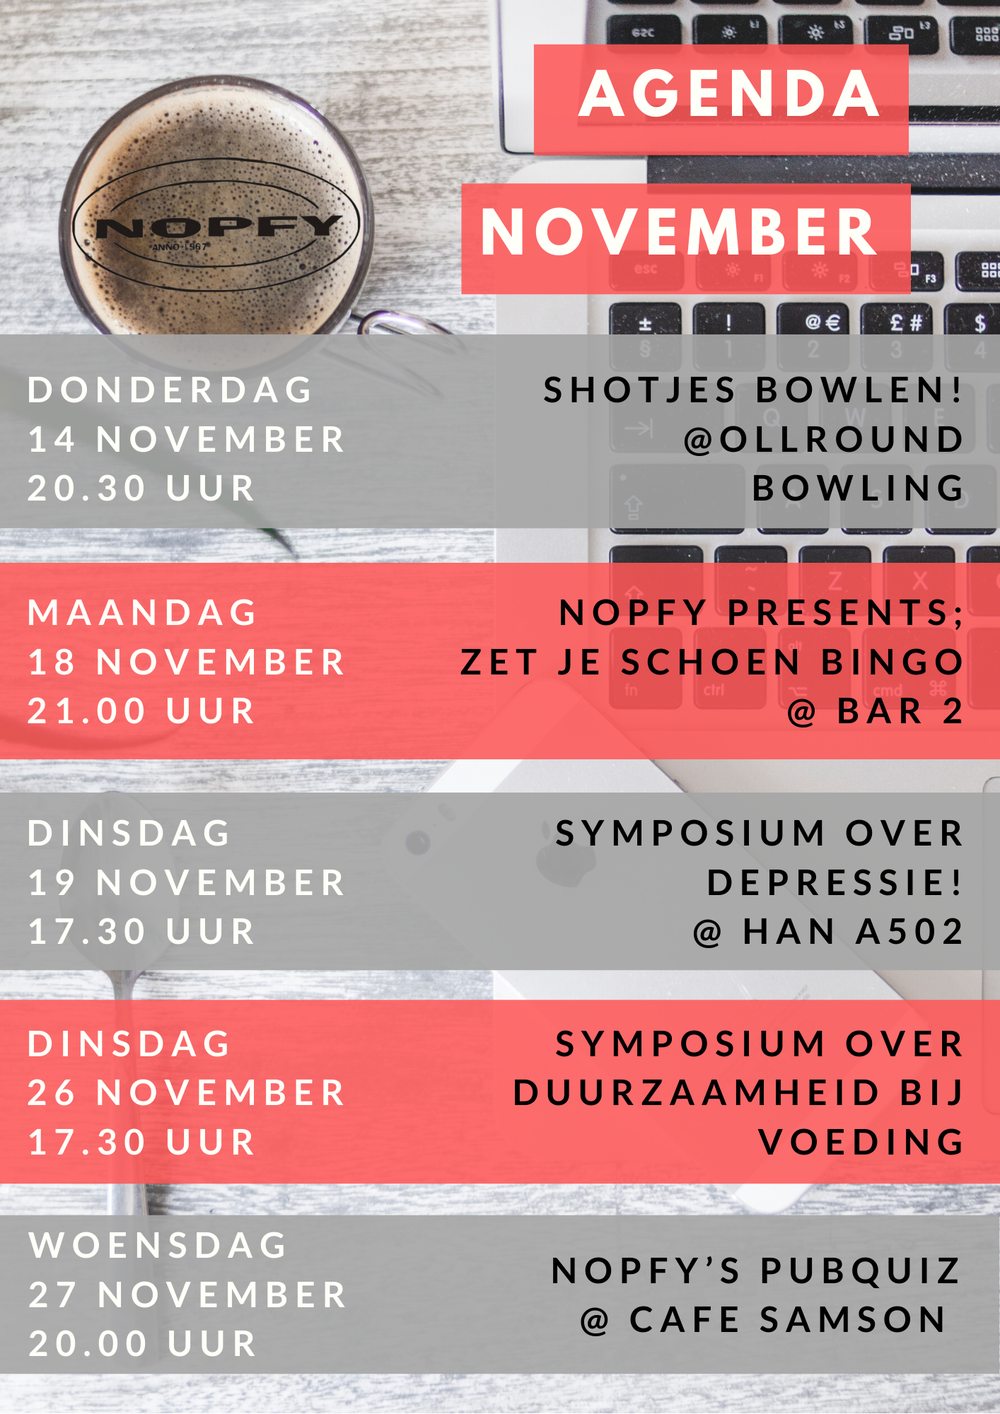 Agenda November!